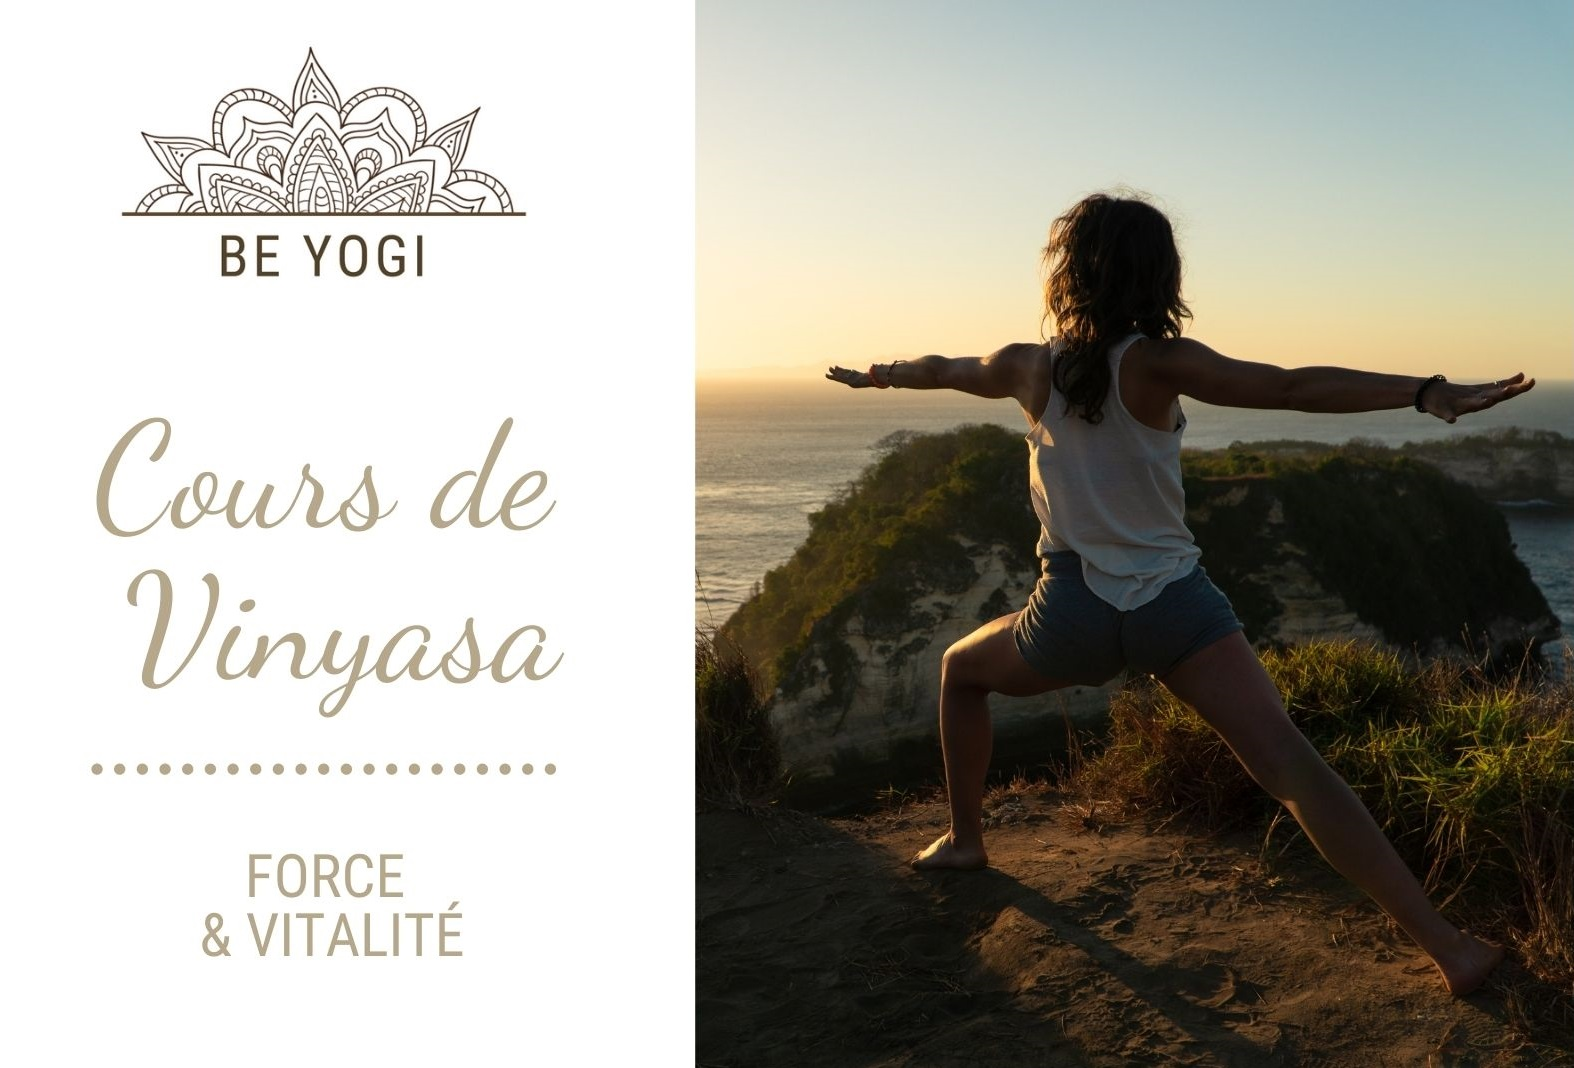 Cours de Vinyasa 2